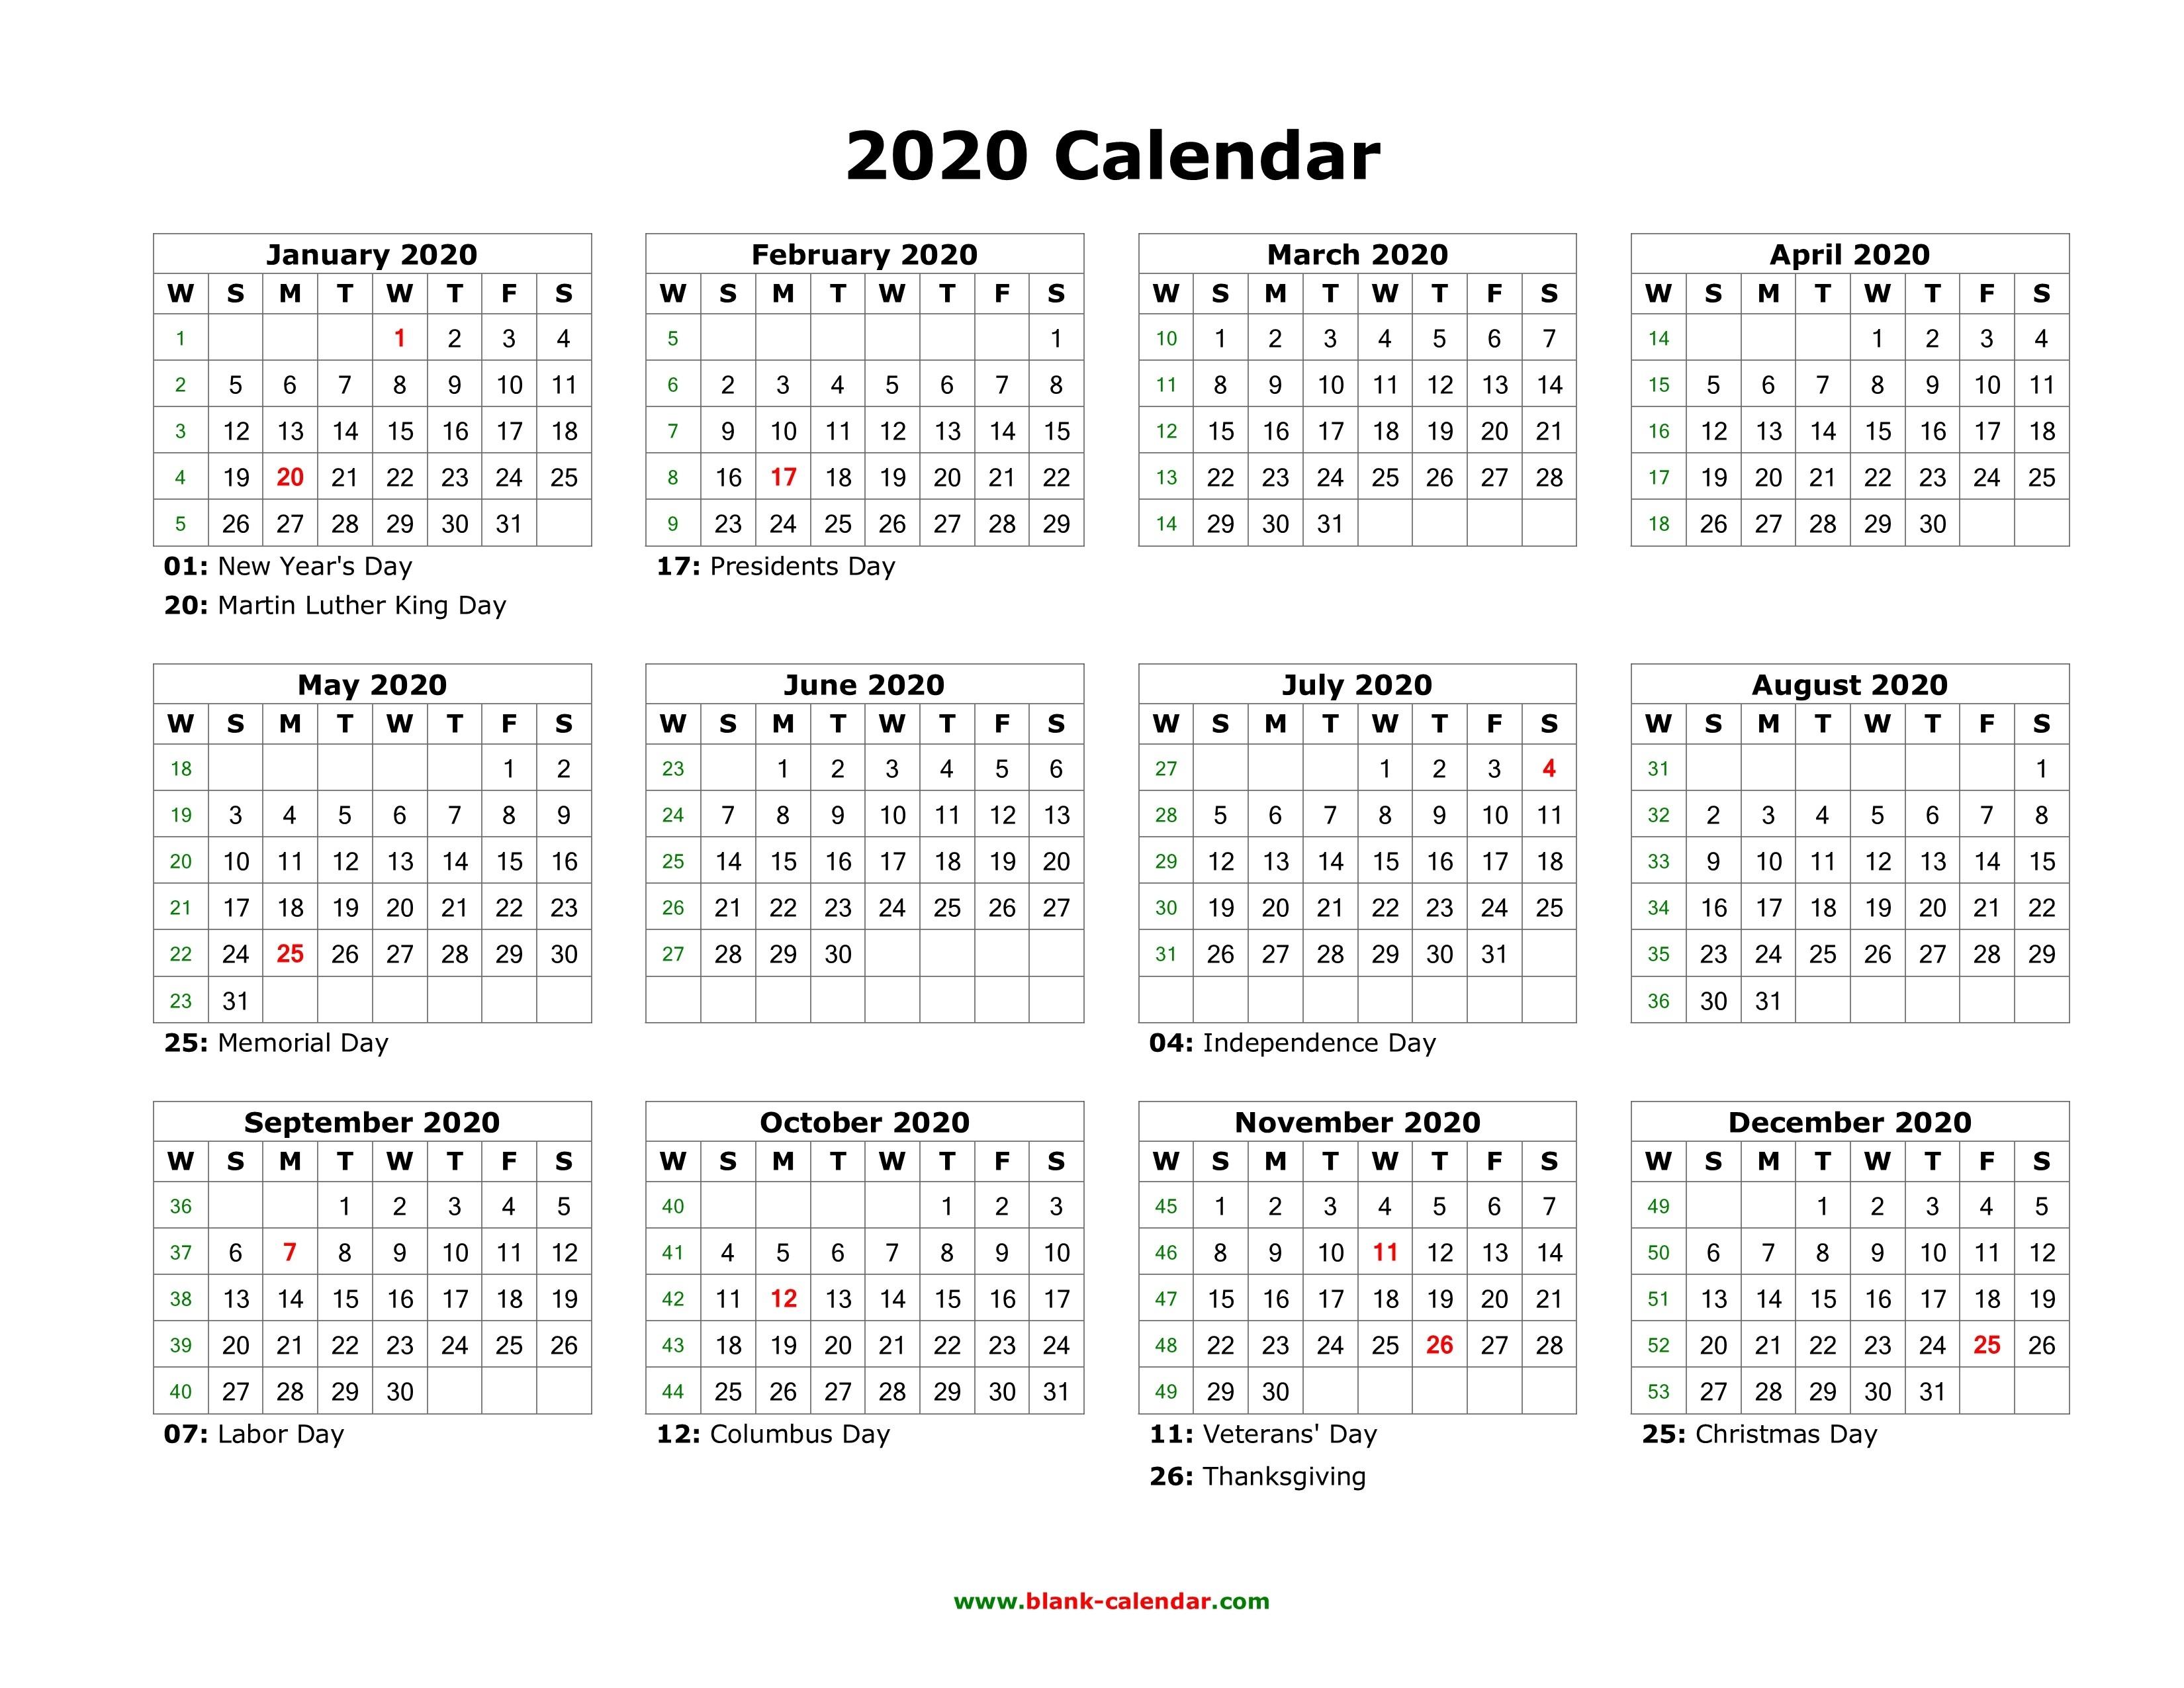 Blank Calendar 2020 | Free Download Calendar Templates-Indesign Calendar Template 2020